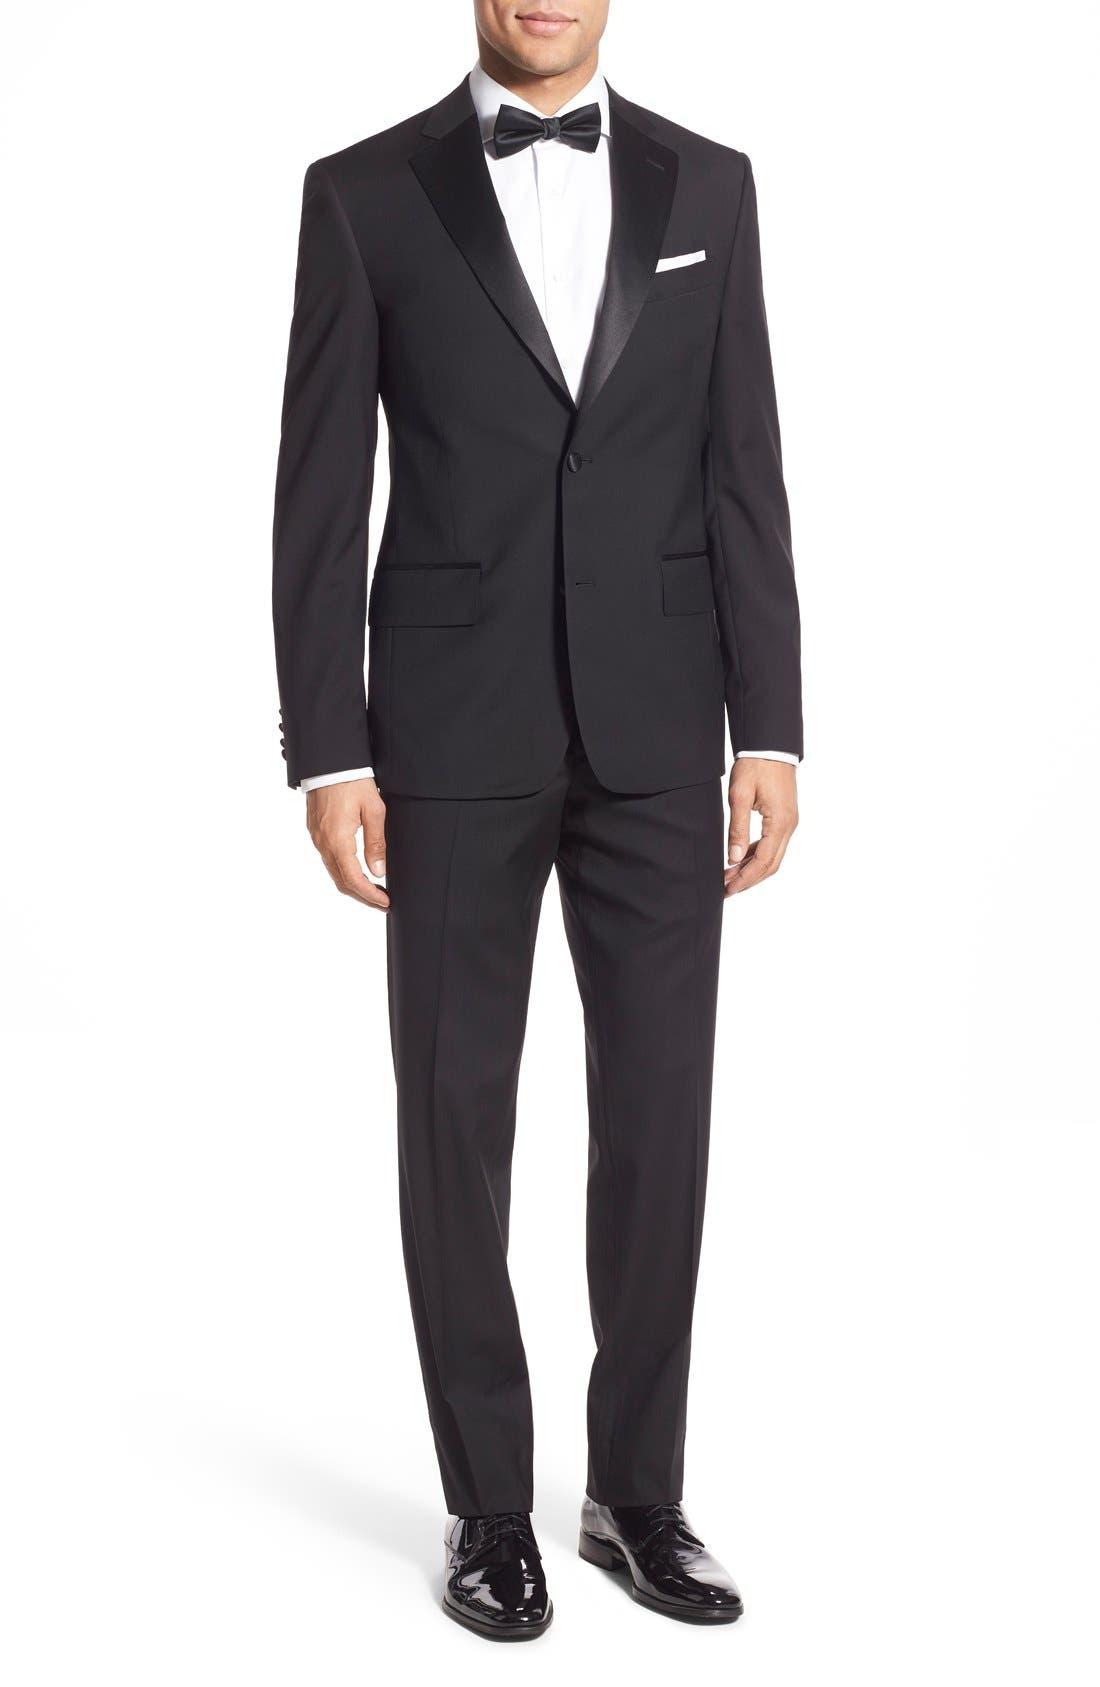 Trim Fit Wool Tuxedo by Nordstrom Men's Shop